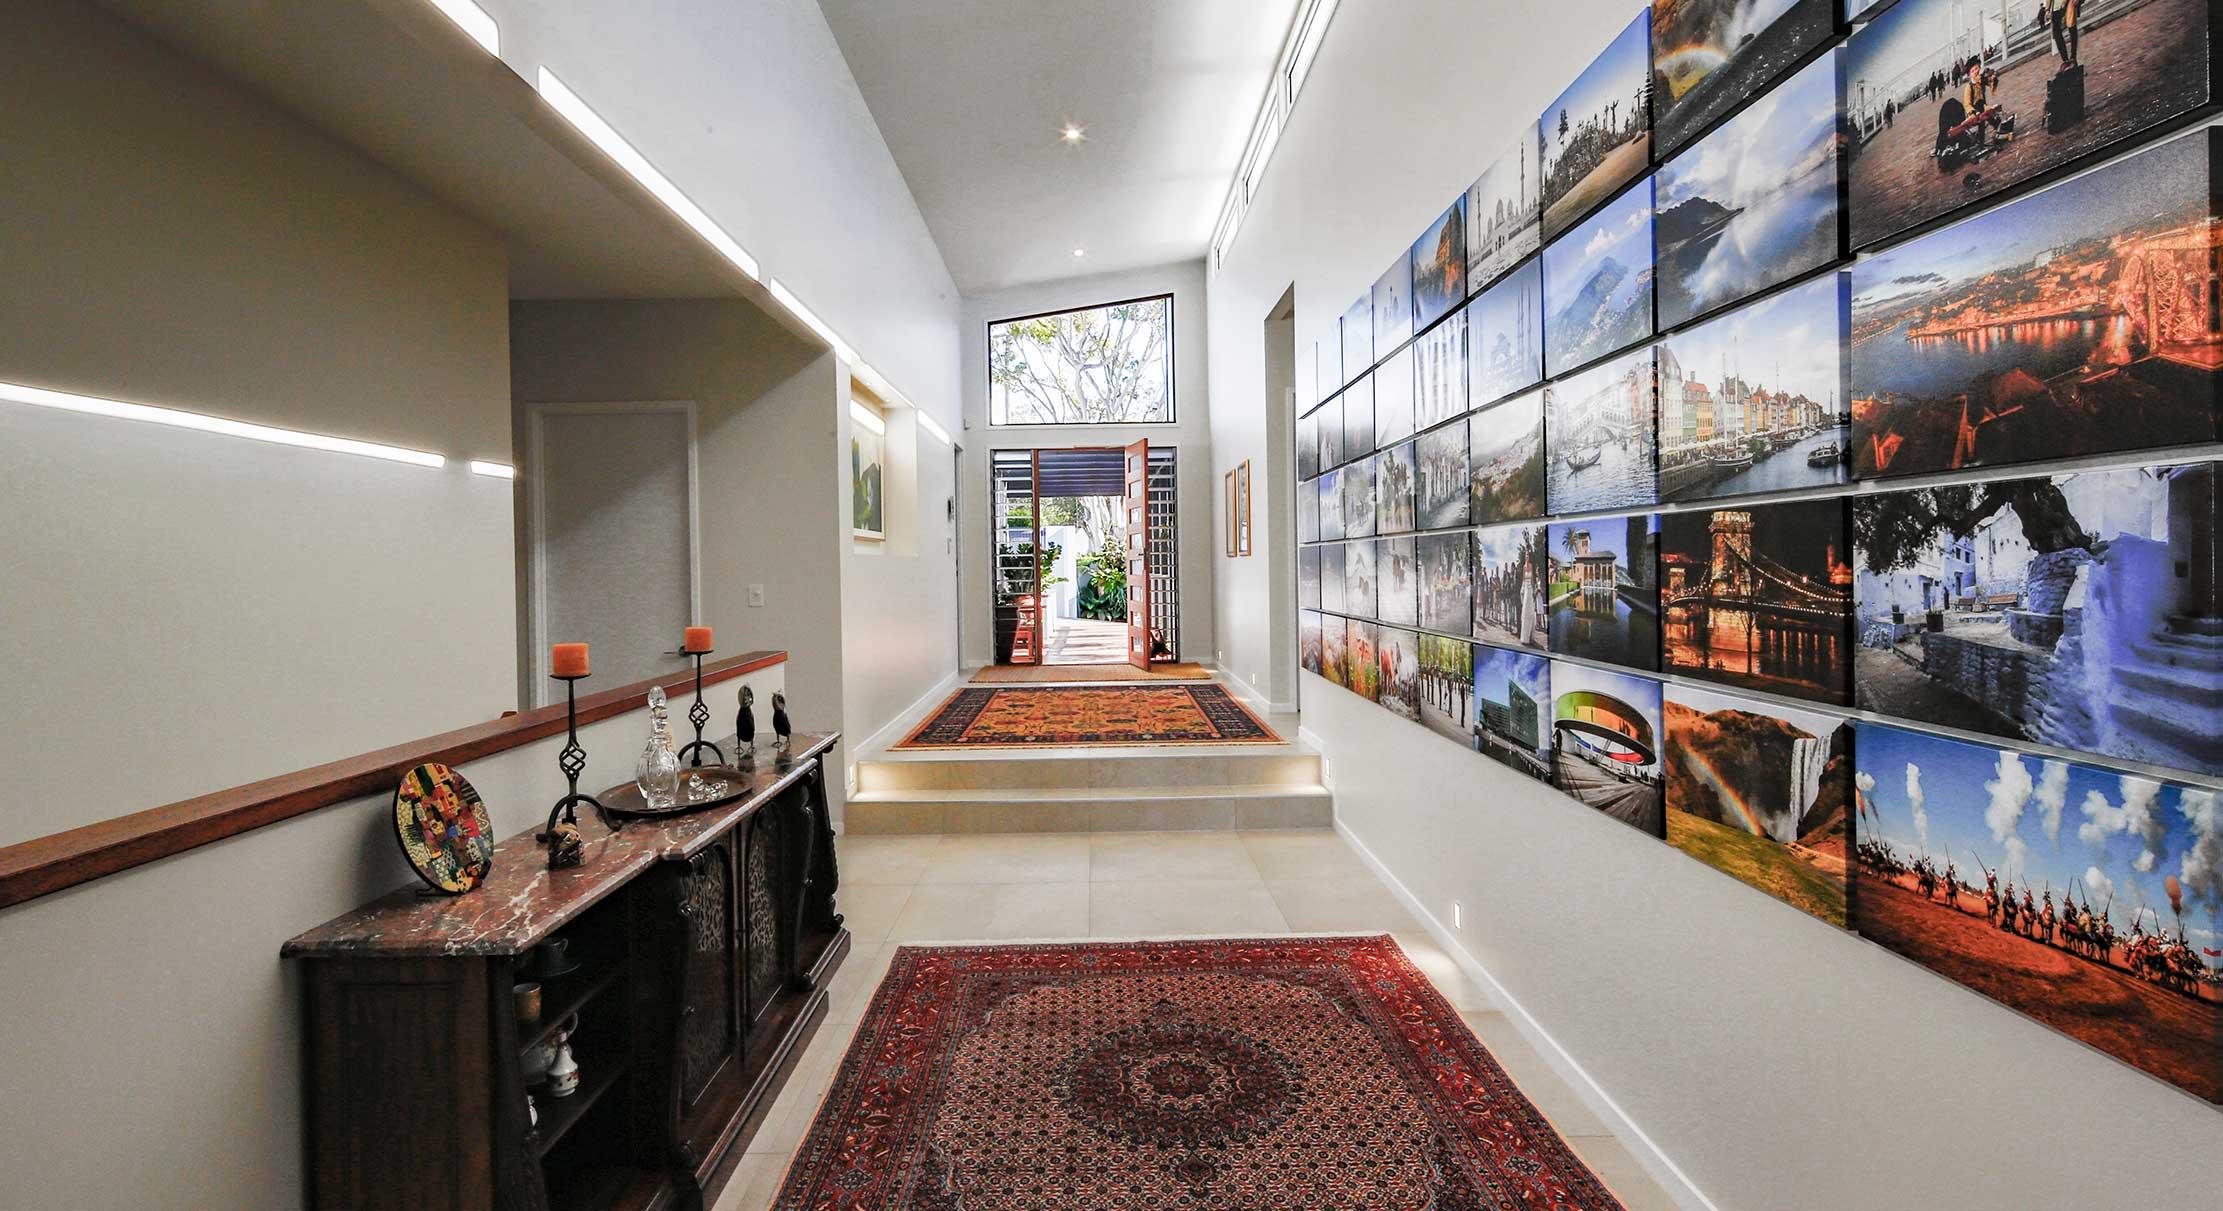 portfolio-3-slider-image-3-hallway-stafford-gary-cramb-constructions-brisbane